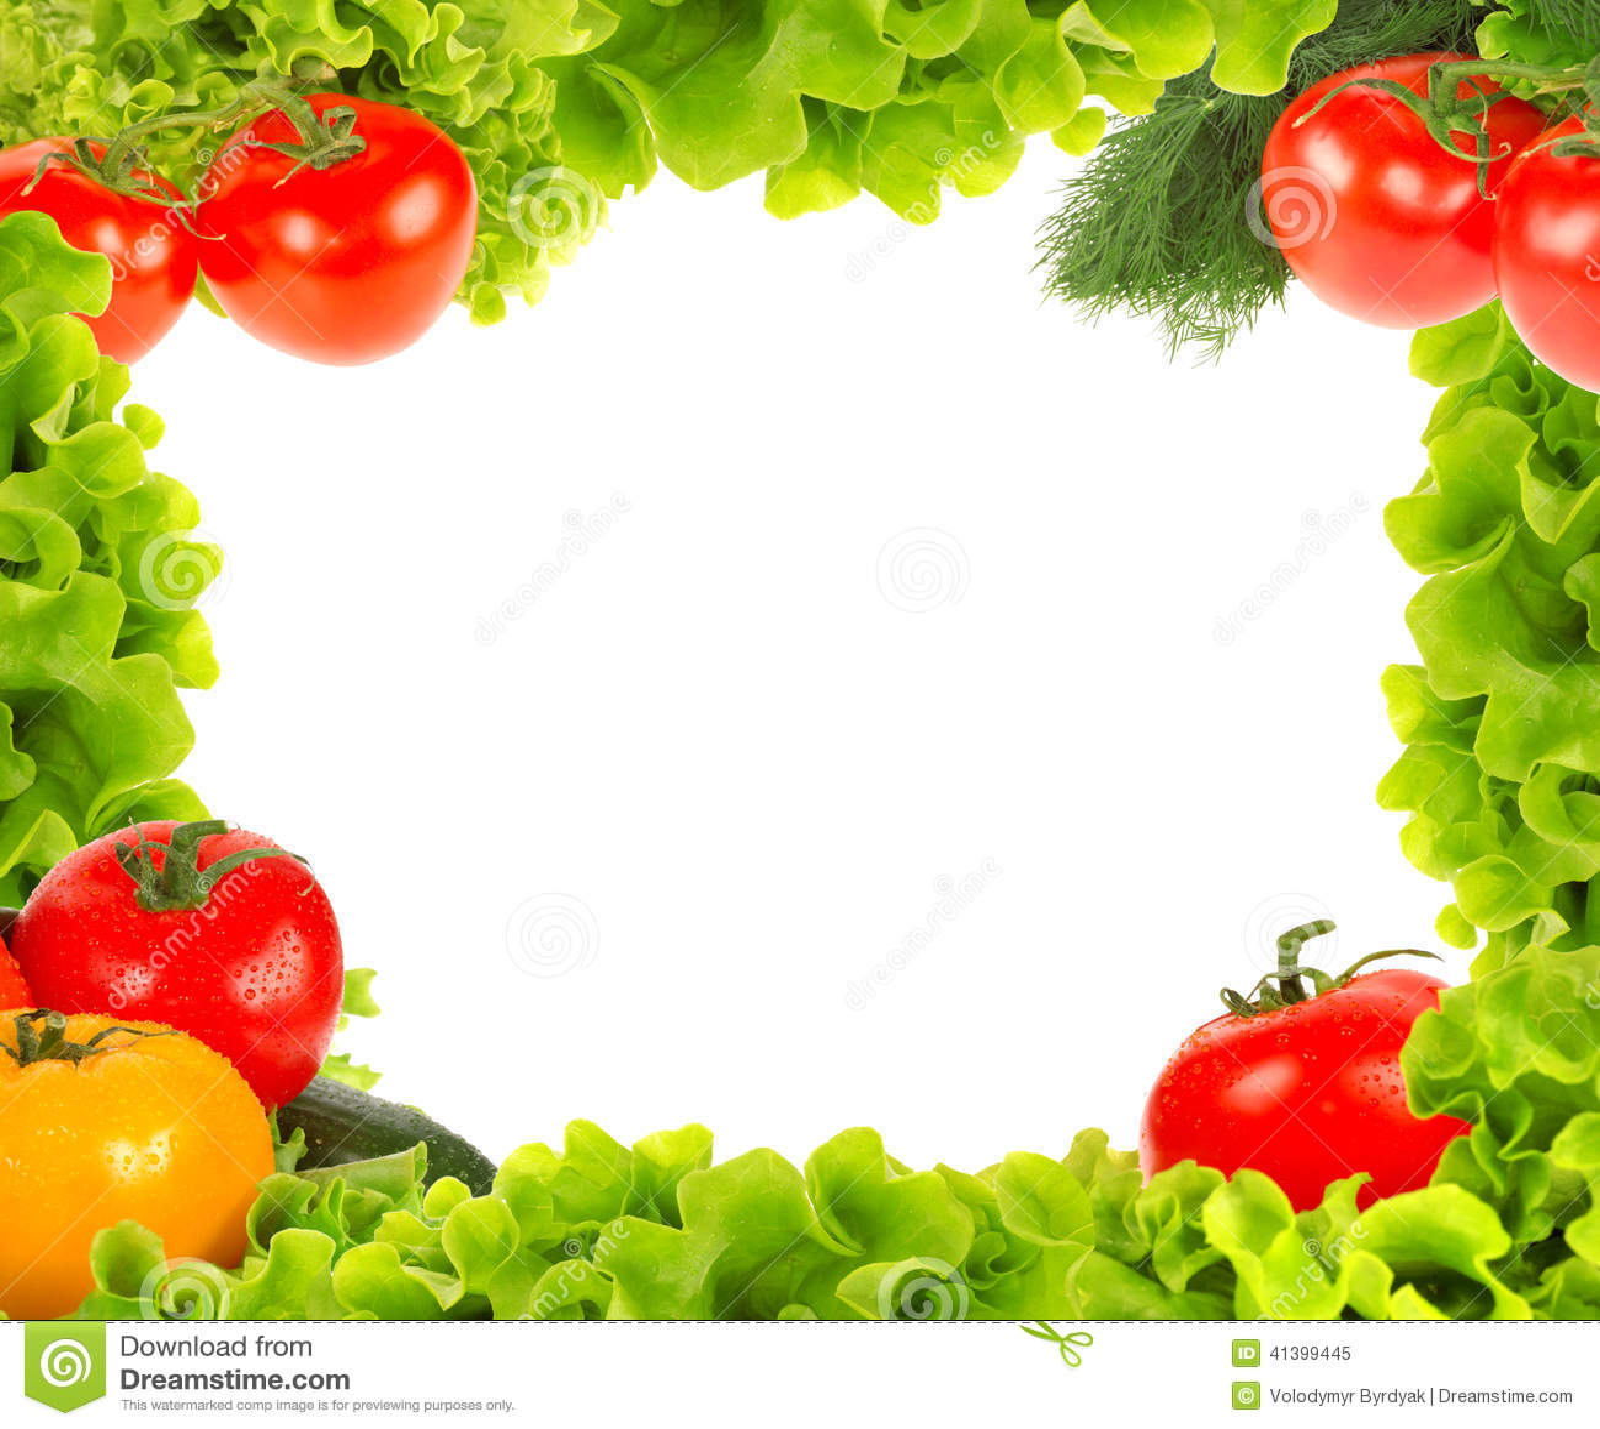 vegetables frame stock image image of health  garden free clip art cooking borders BBQ Border Clip Art